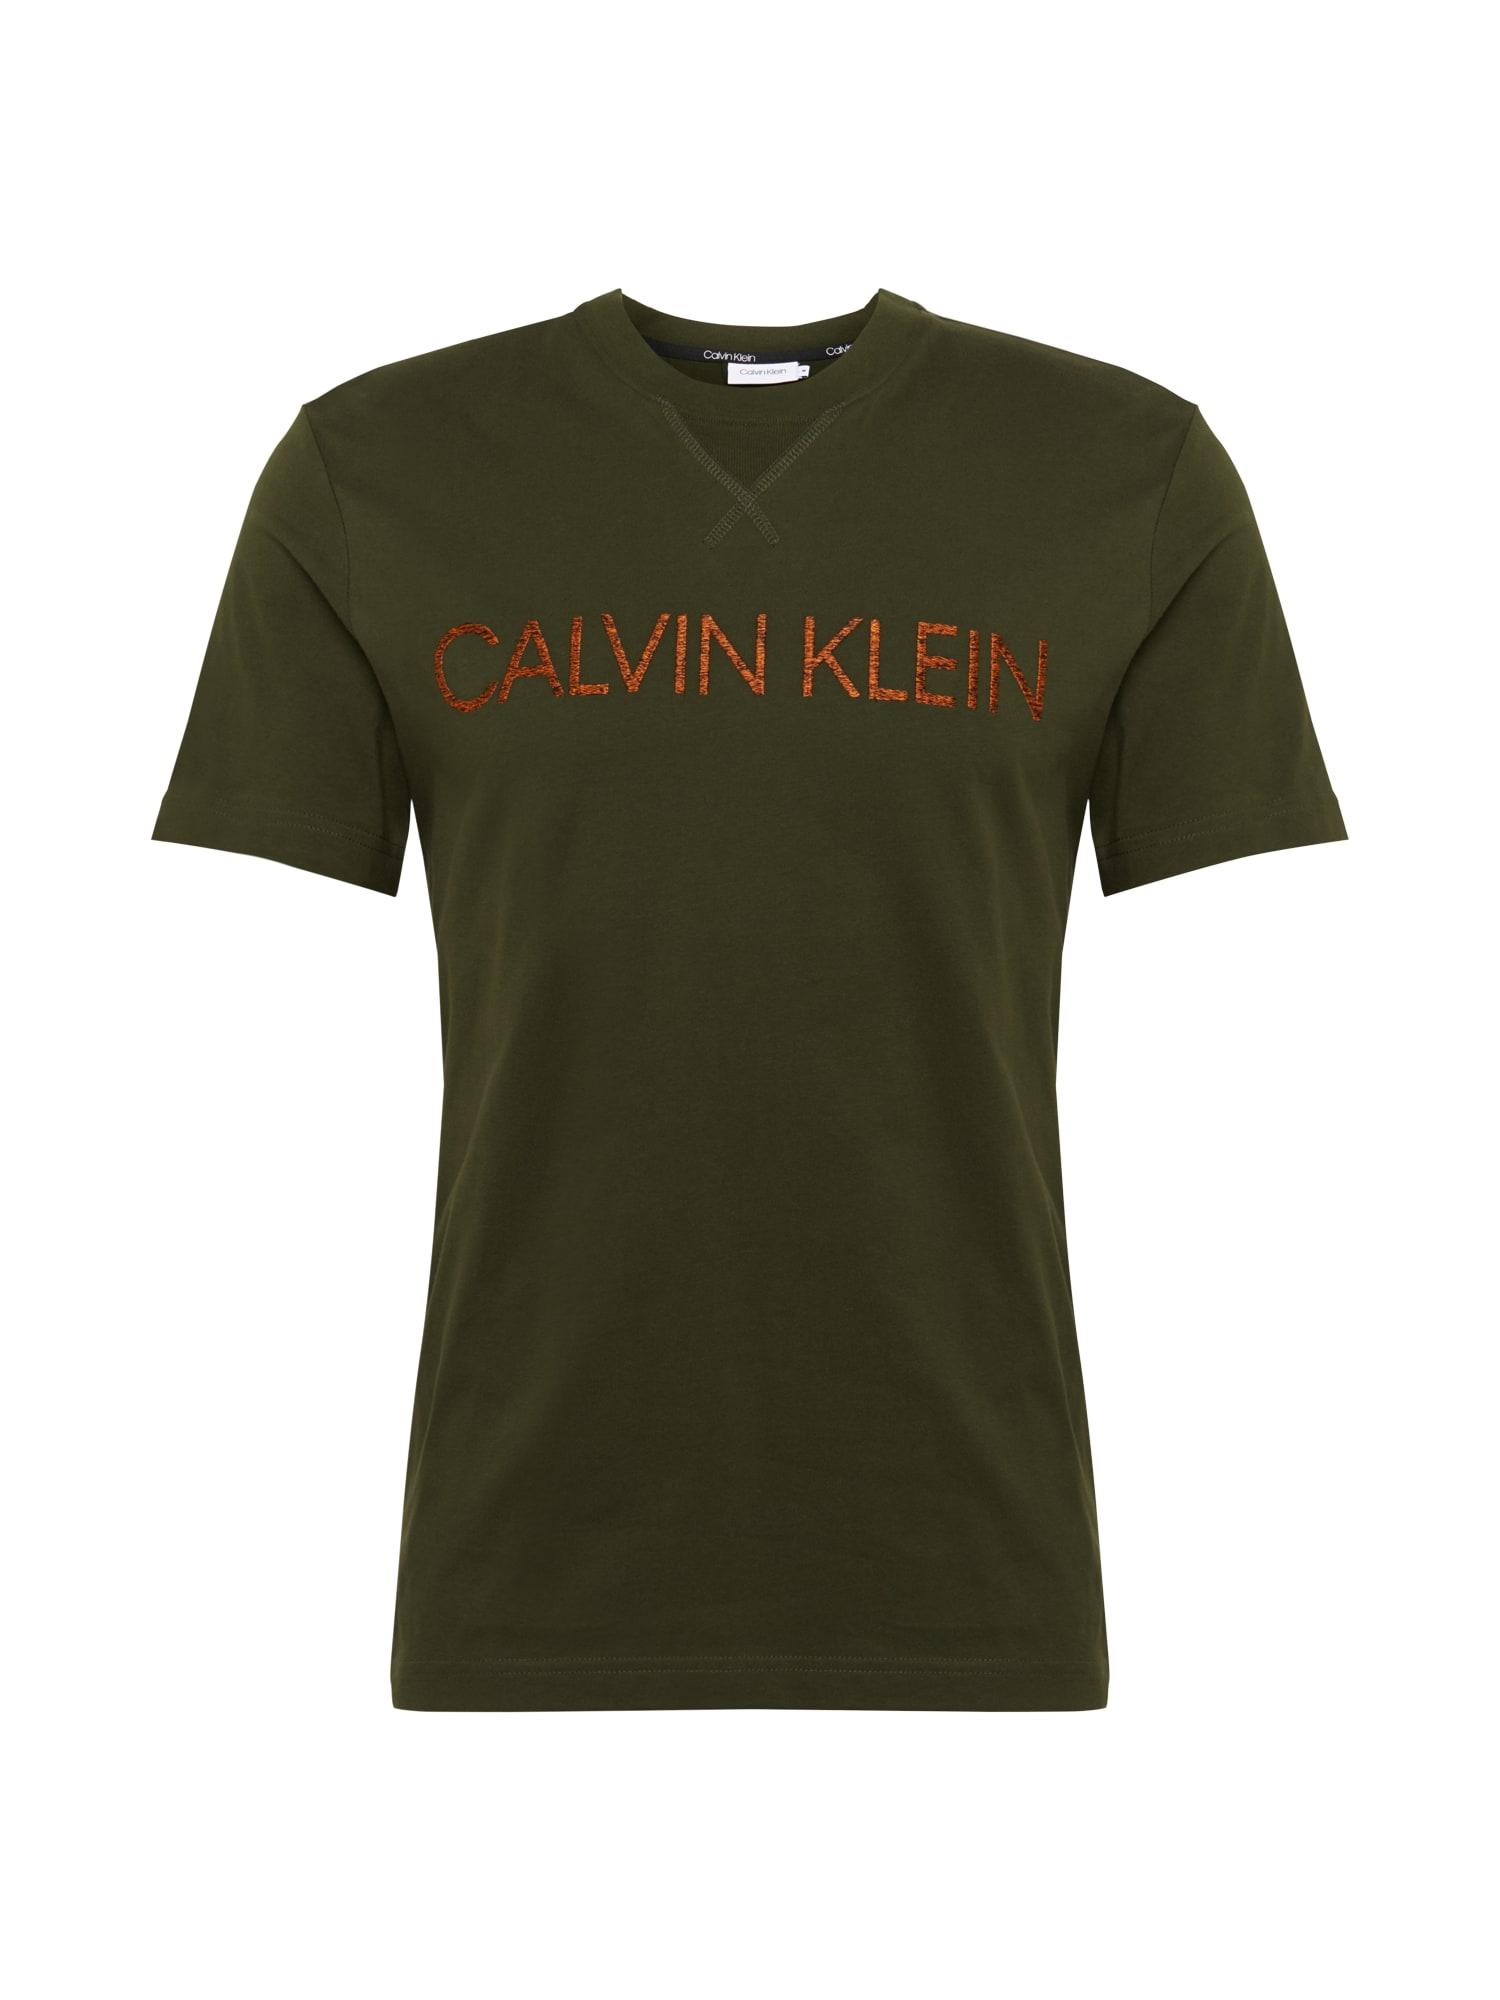 Calvin Klein Tričko  olivová